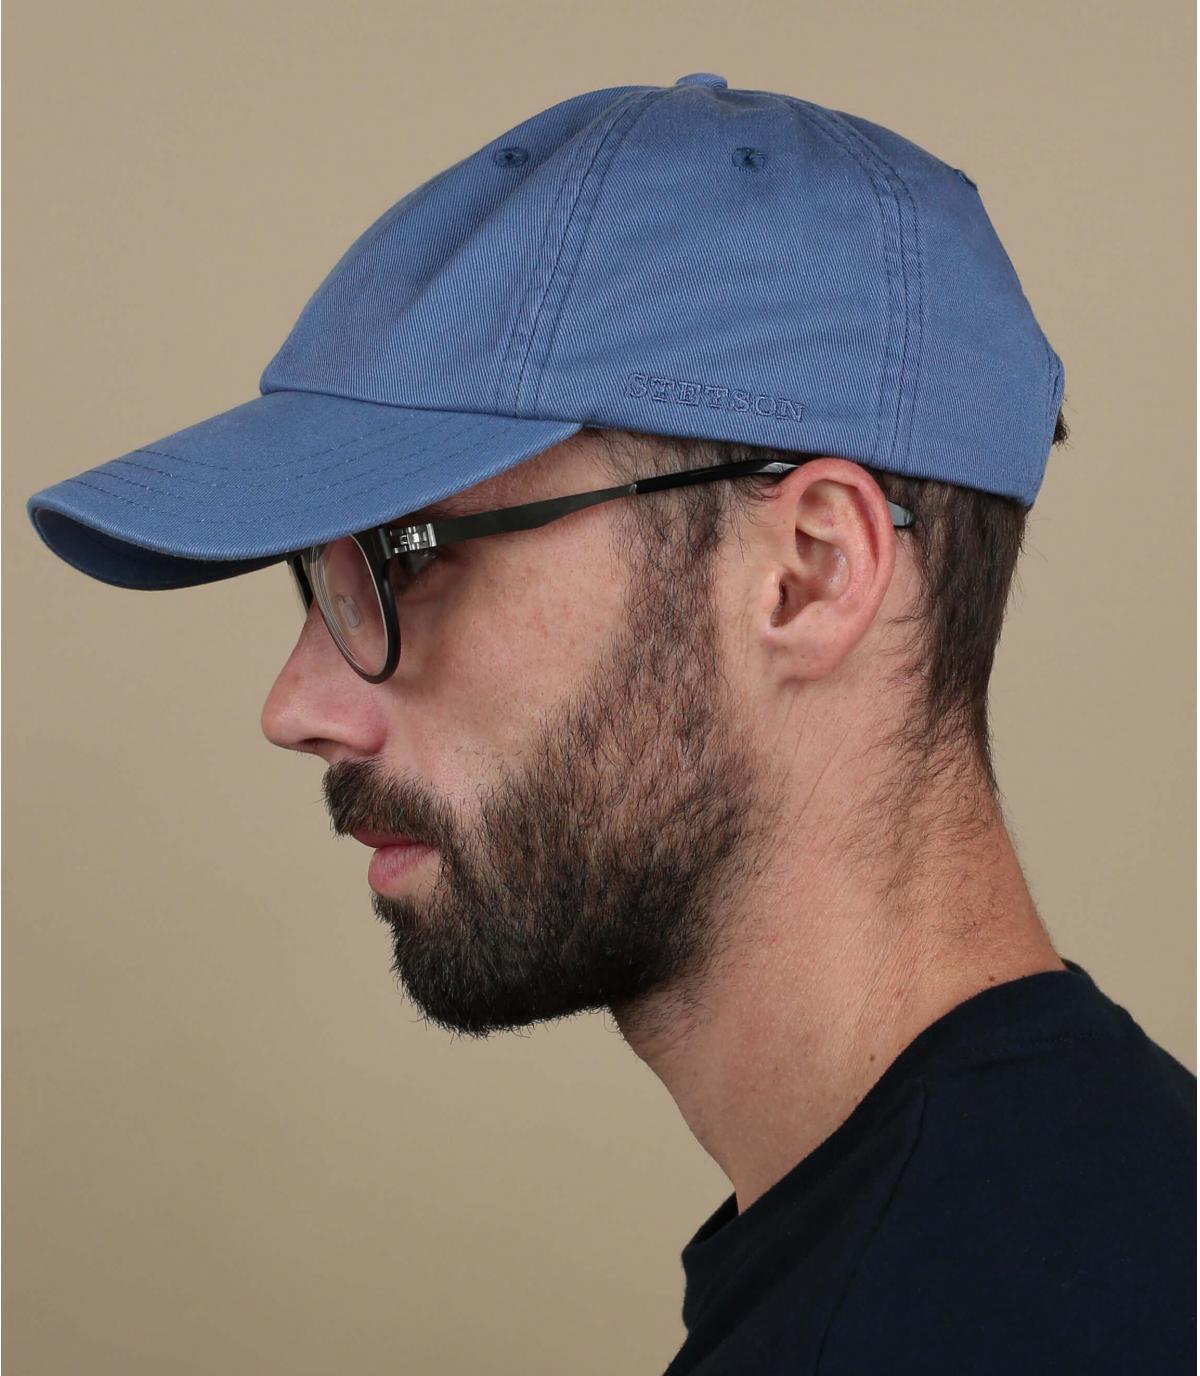 Stetson blue baseball cap